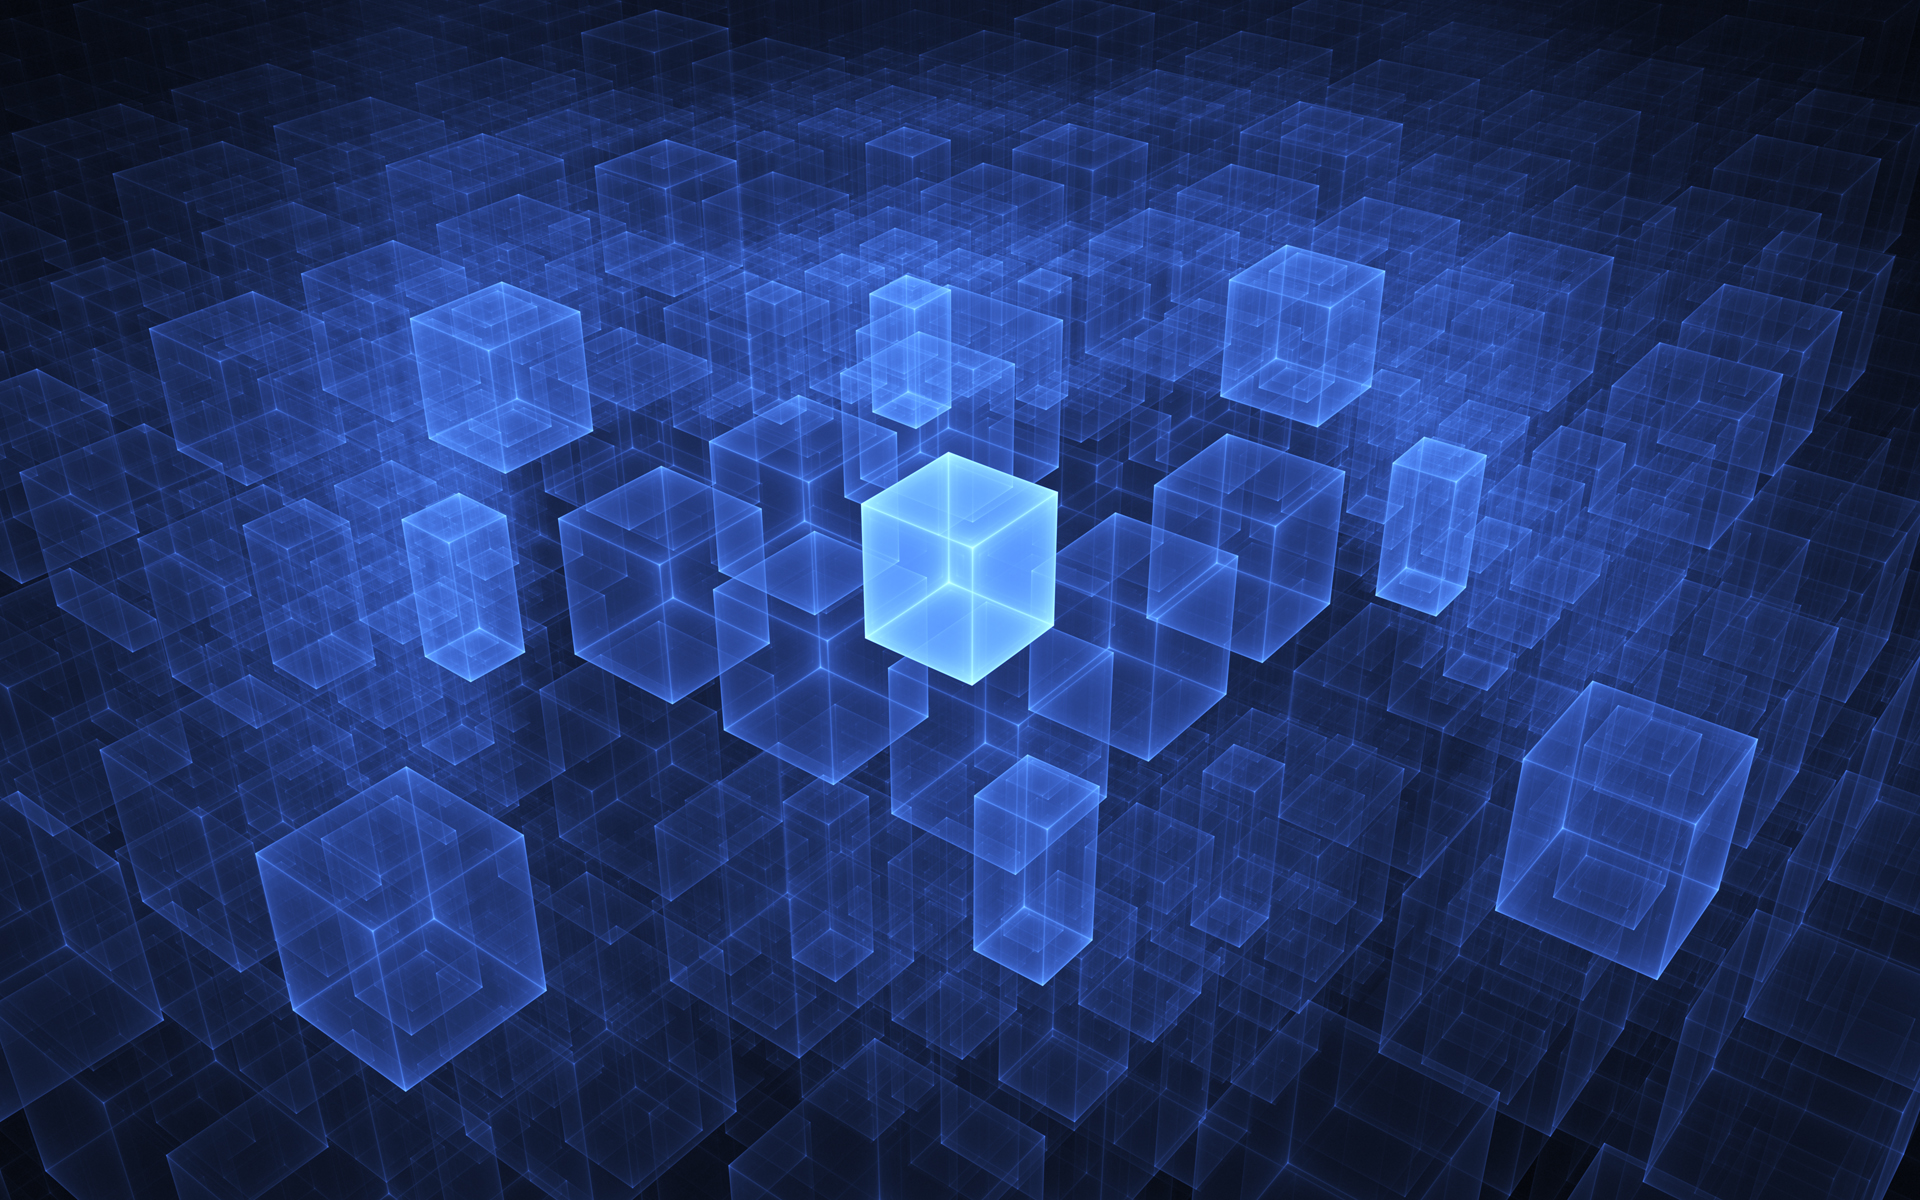 Cube Wallpaper 1920x1200 Cube 1920x1200